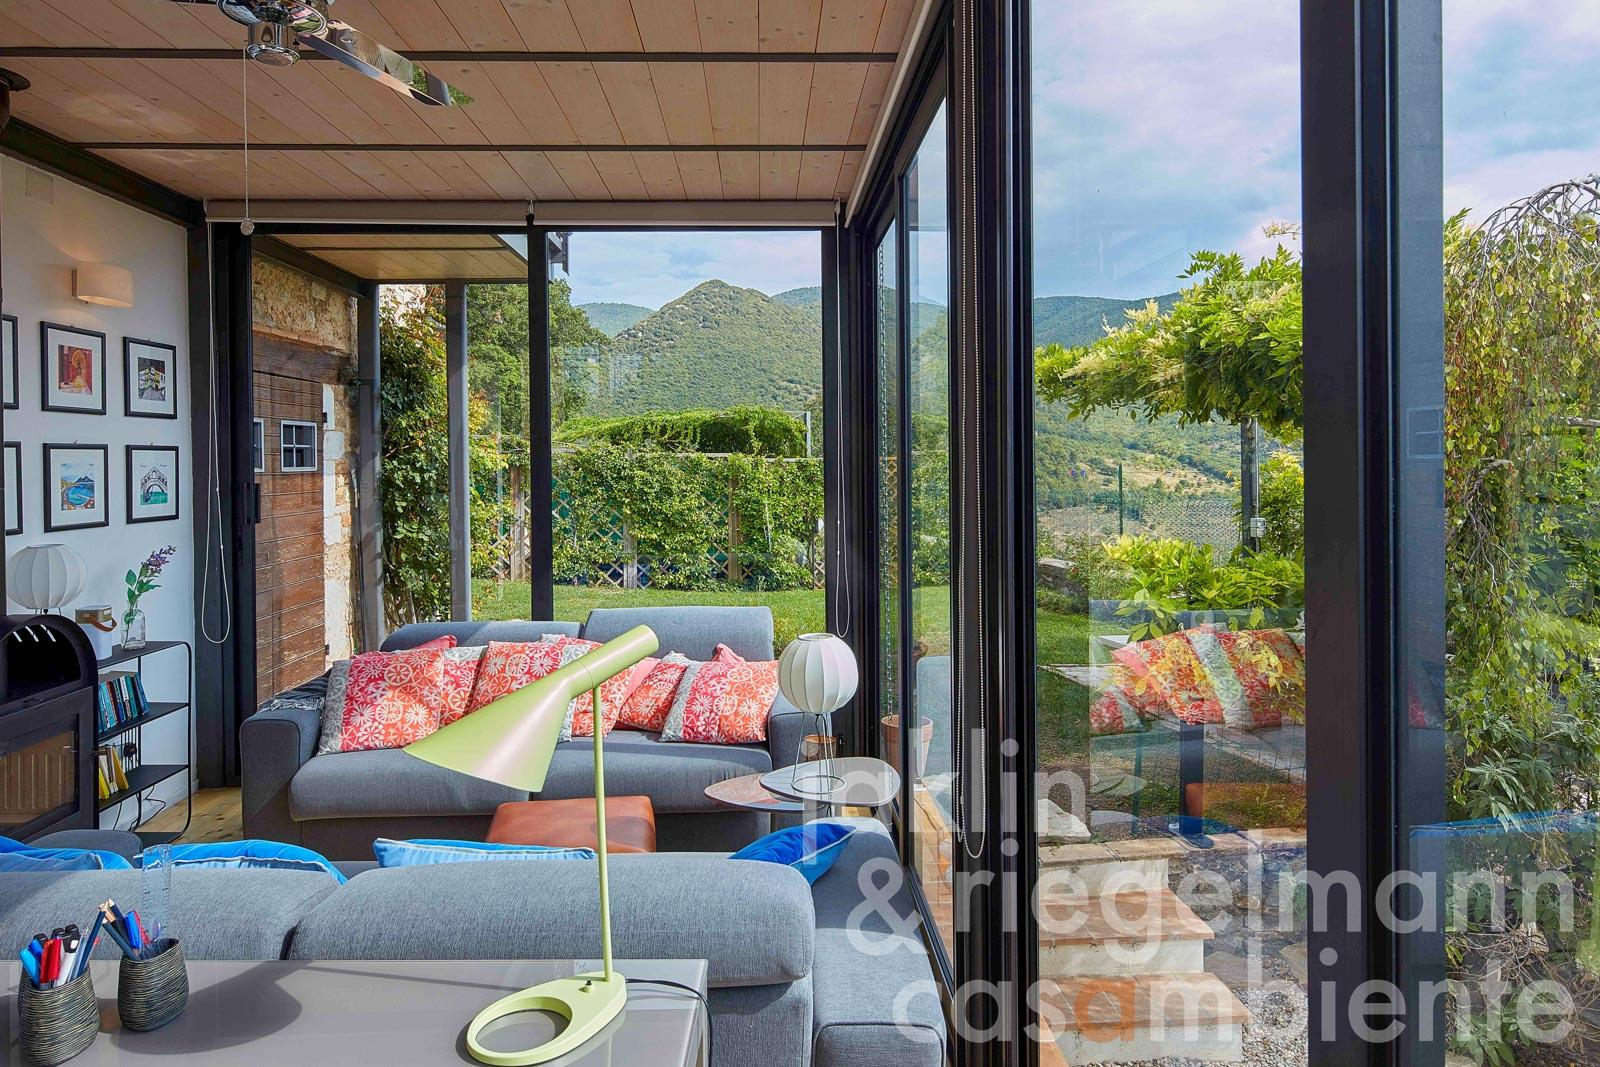 Casa indipendente con giardino, oliveto e piscina panoramica con vista sulla Valle Umbra